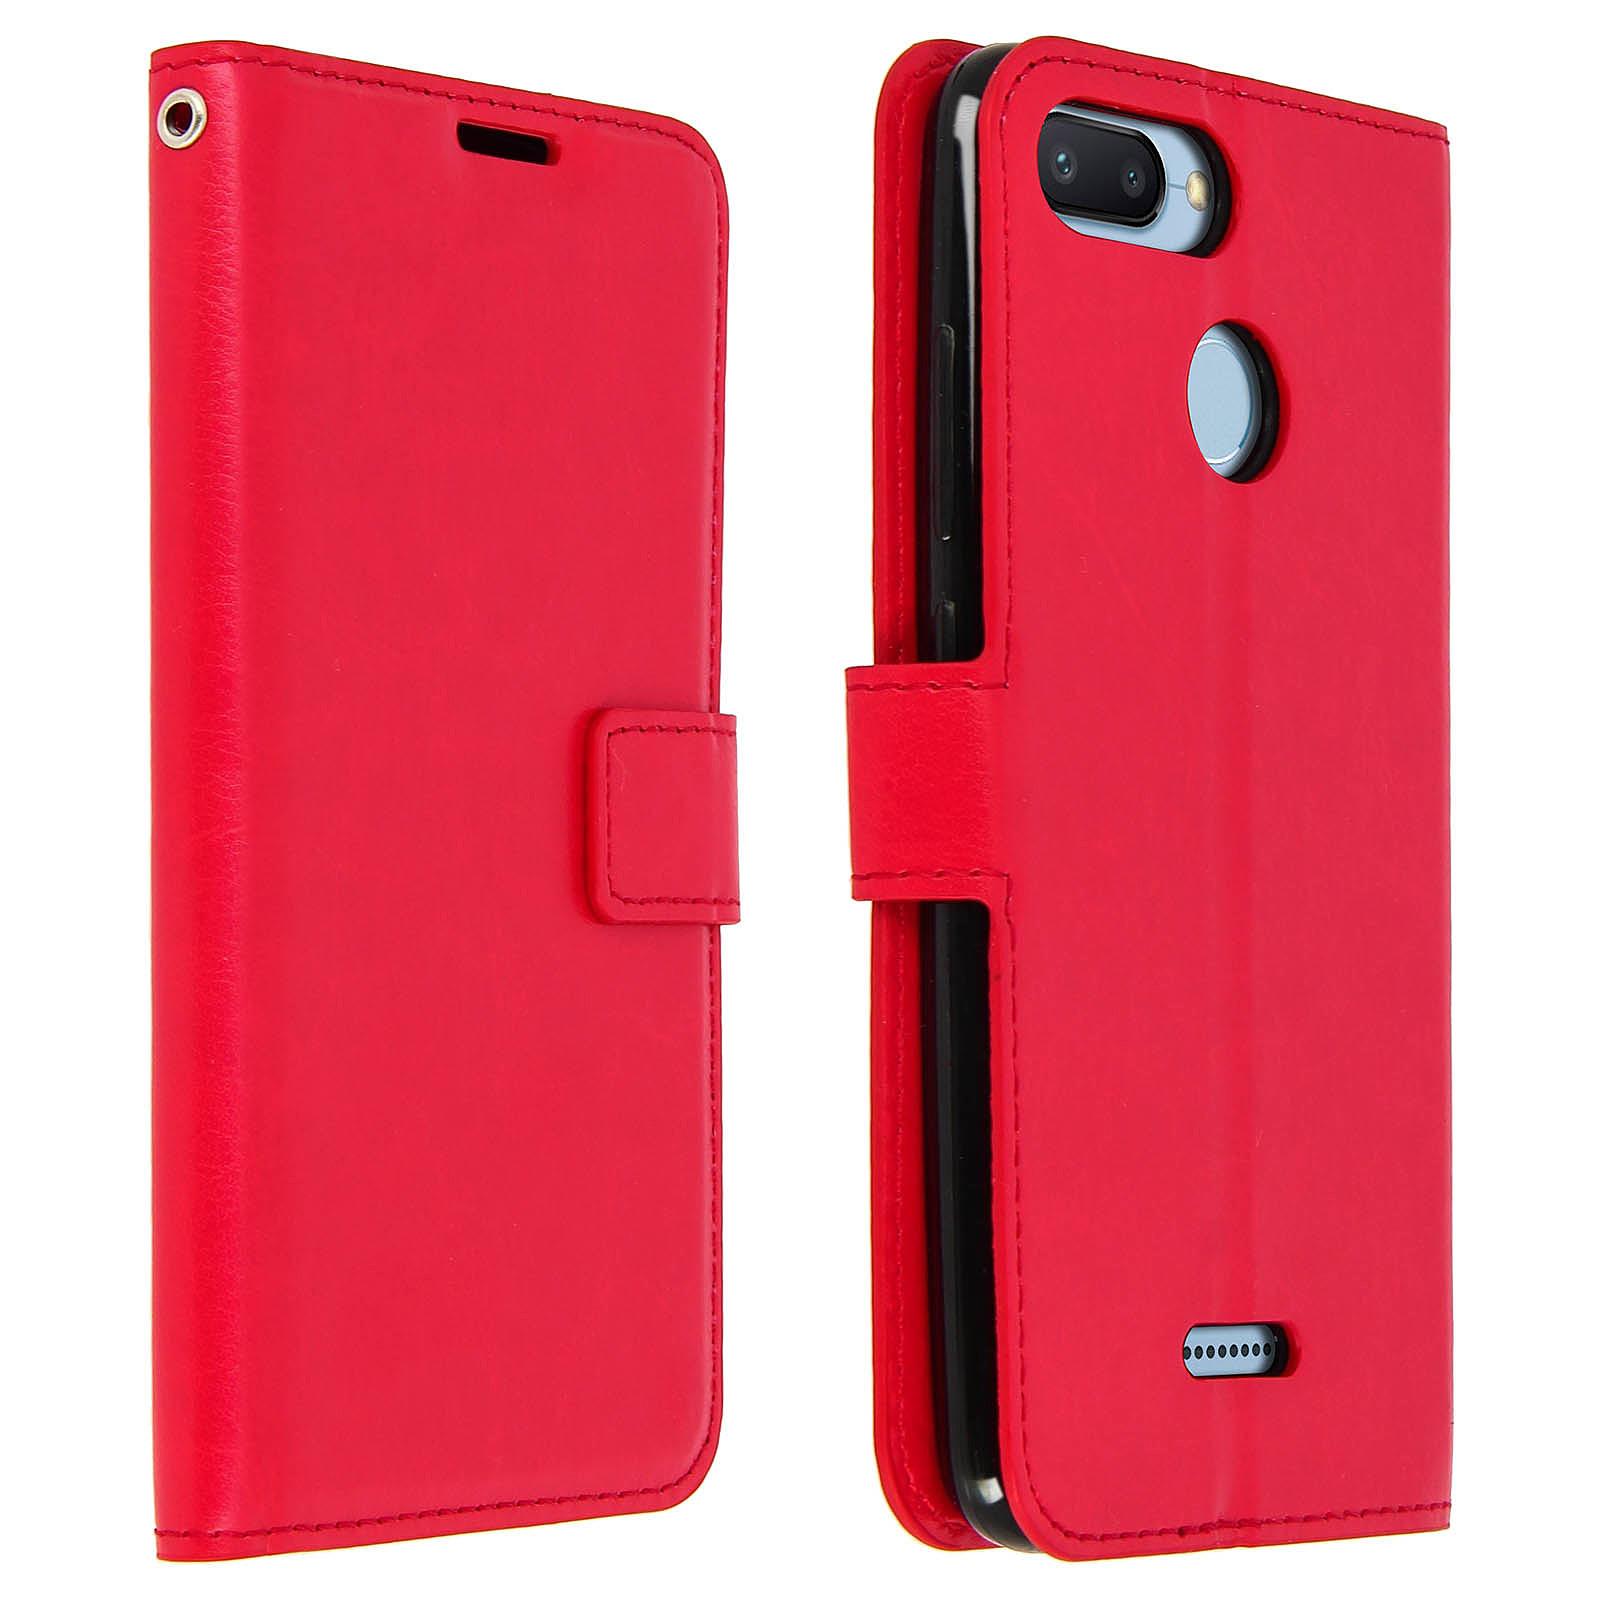 Avizar Etui folio Rouge pour Xiaomi Redmi 6A, Xiaomi Redmi 6